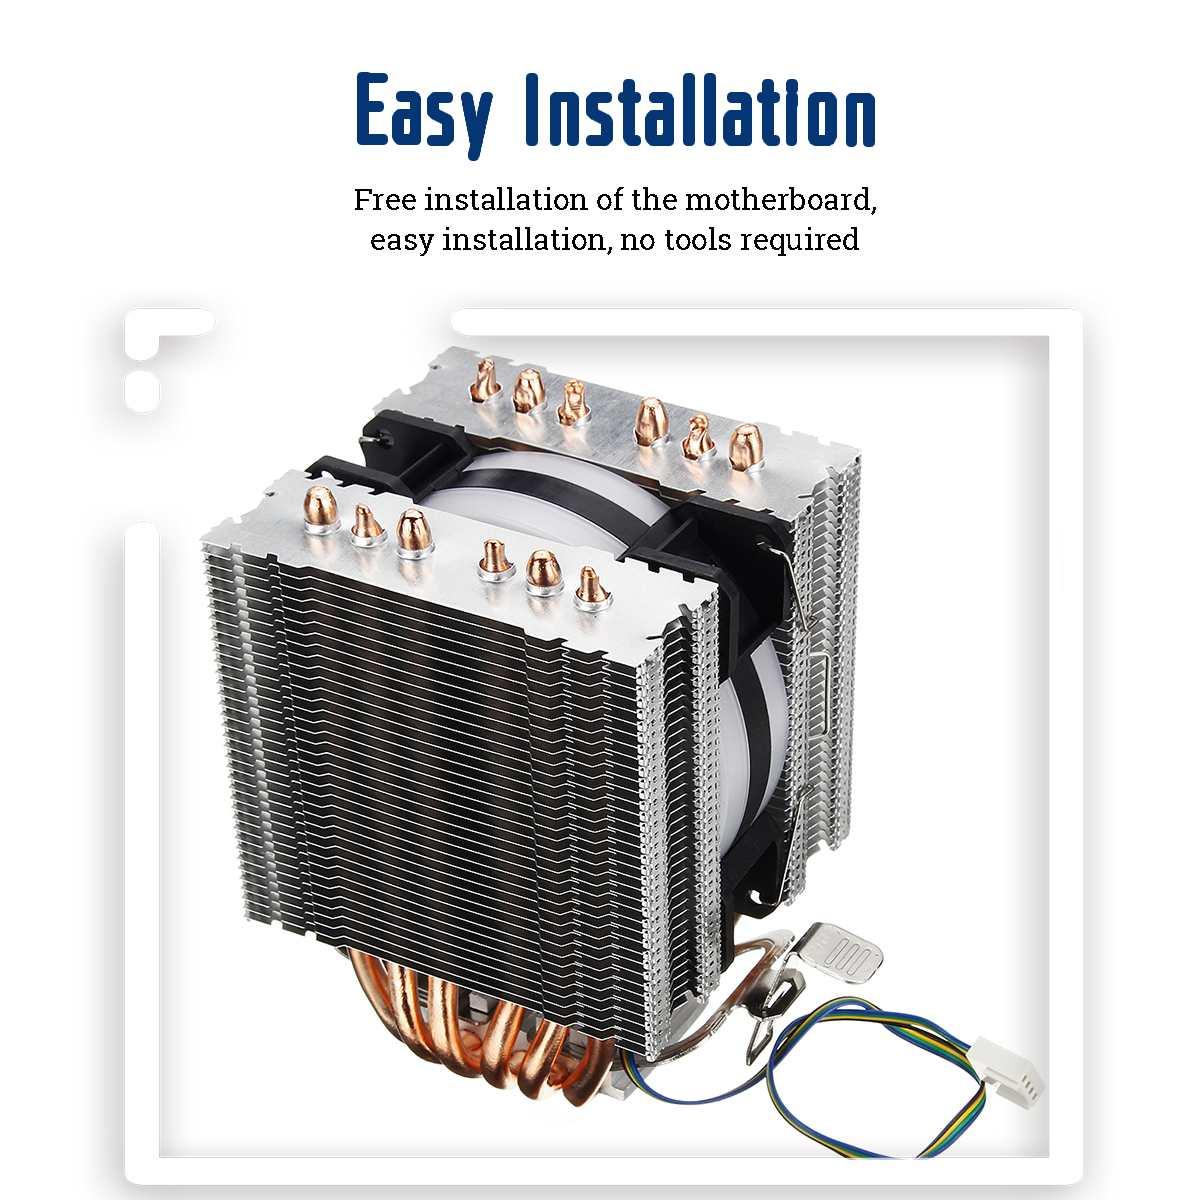 6 Heat Pipe CPU Heatsink for Intel 775/1150/1151/1155/1156/1366 and All AMD 3